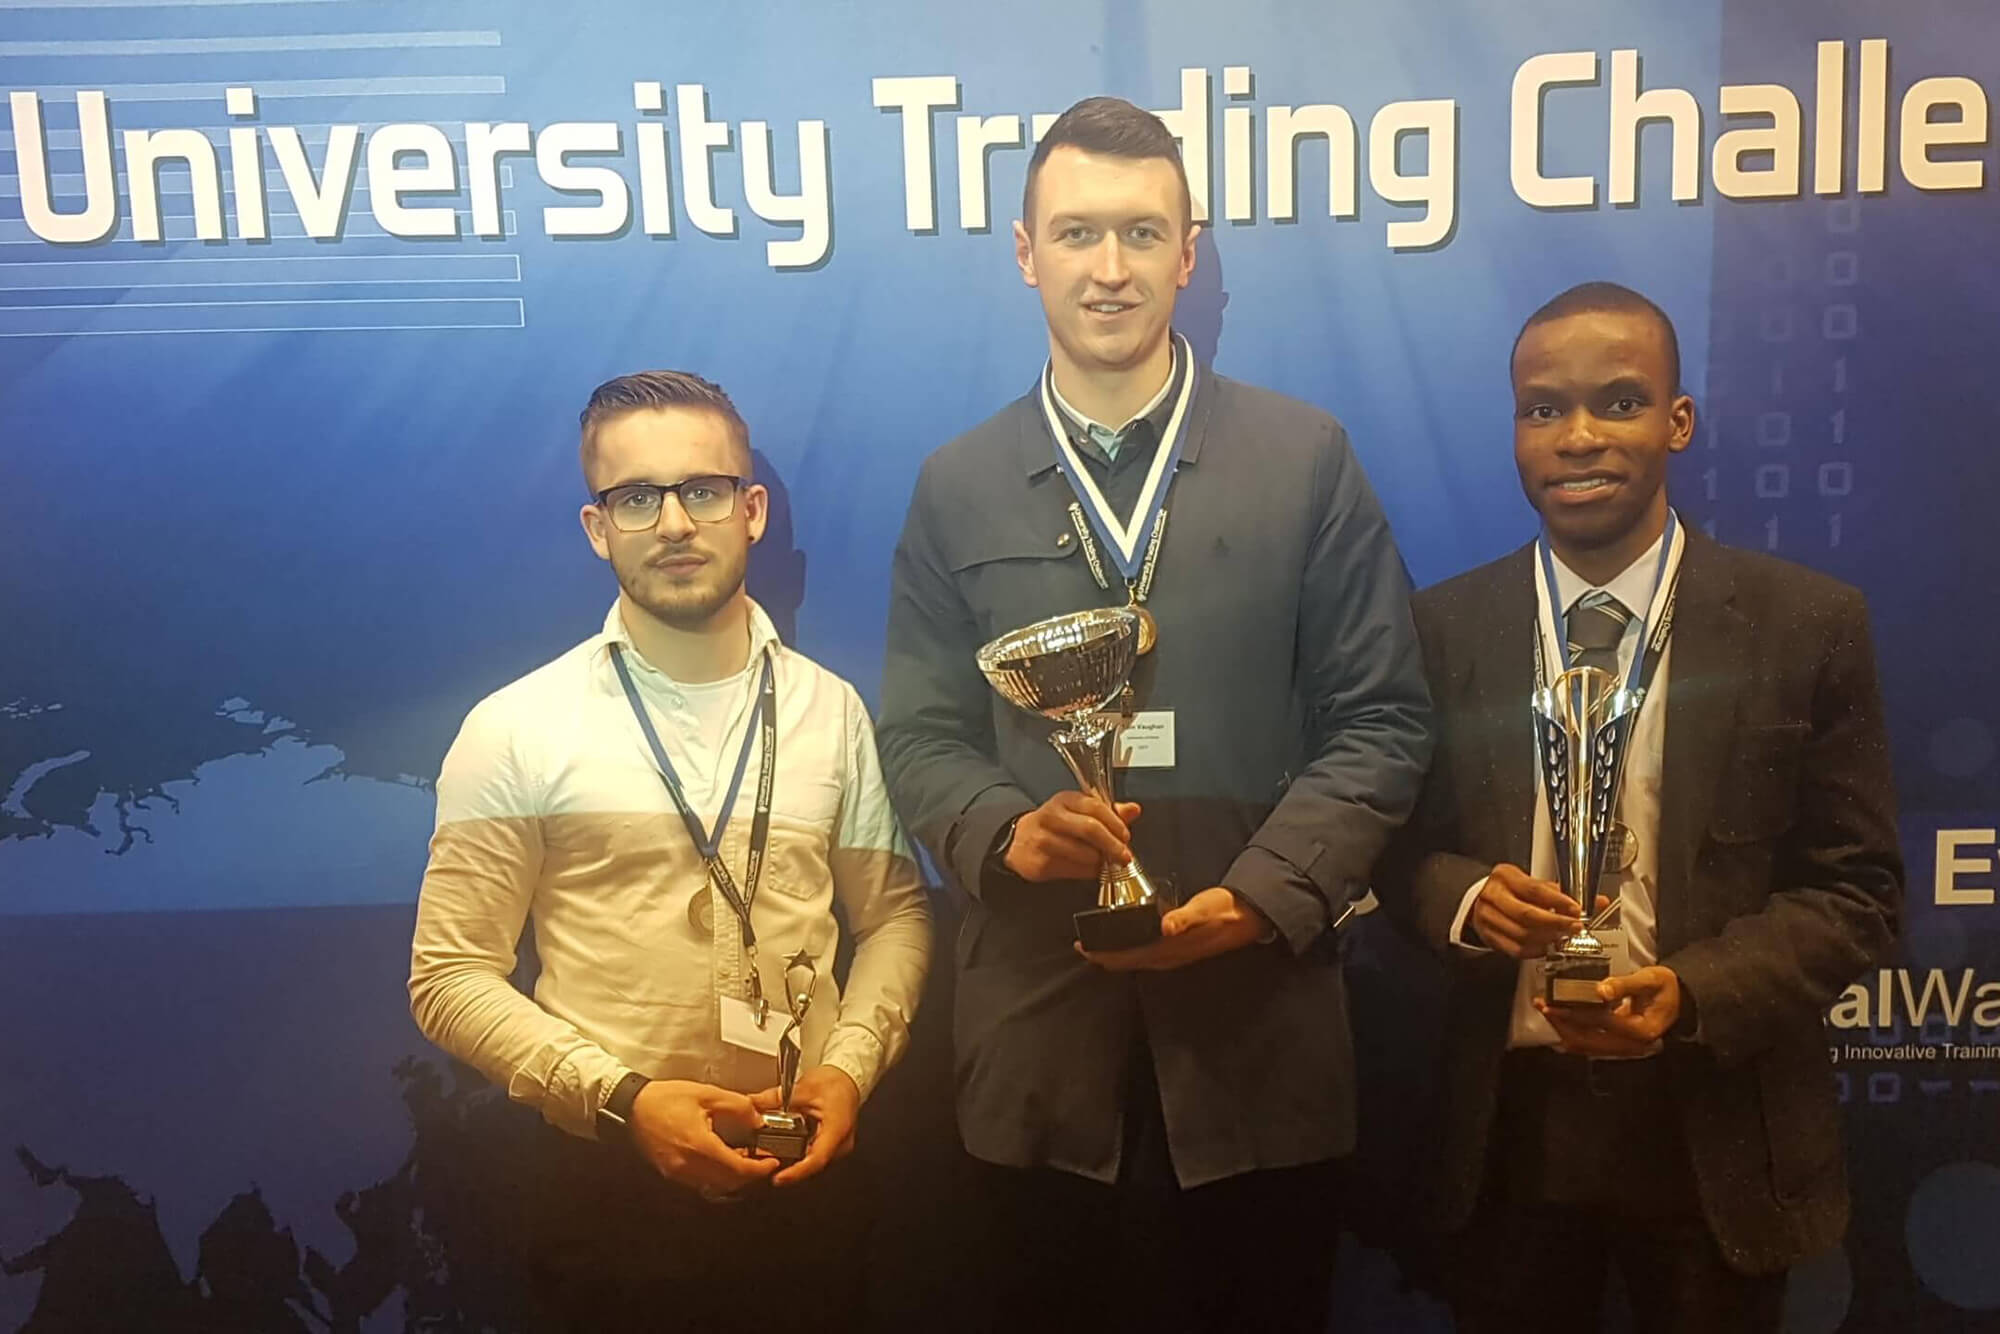 University Trading Challenge winners